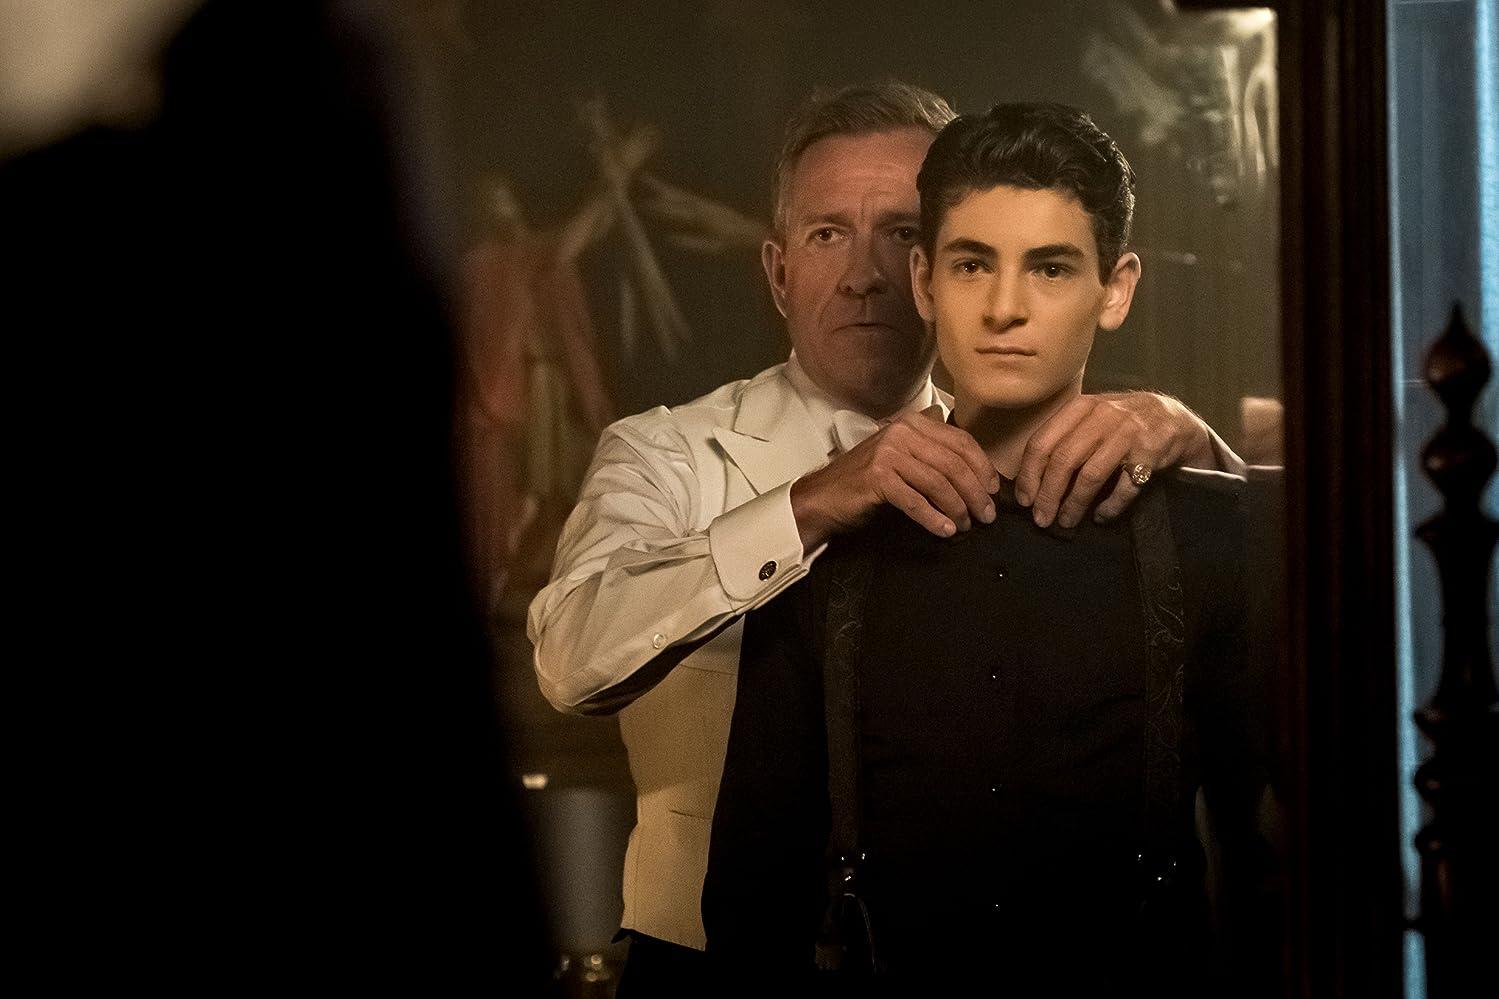 Sean Pertwee and David Mazouz in Gotham (2014)